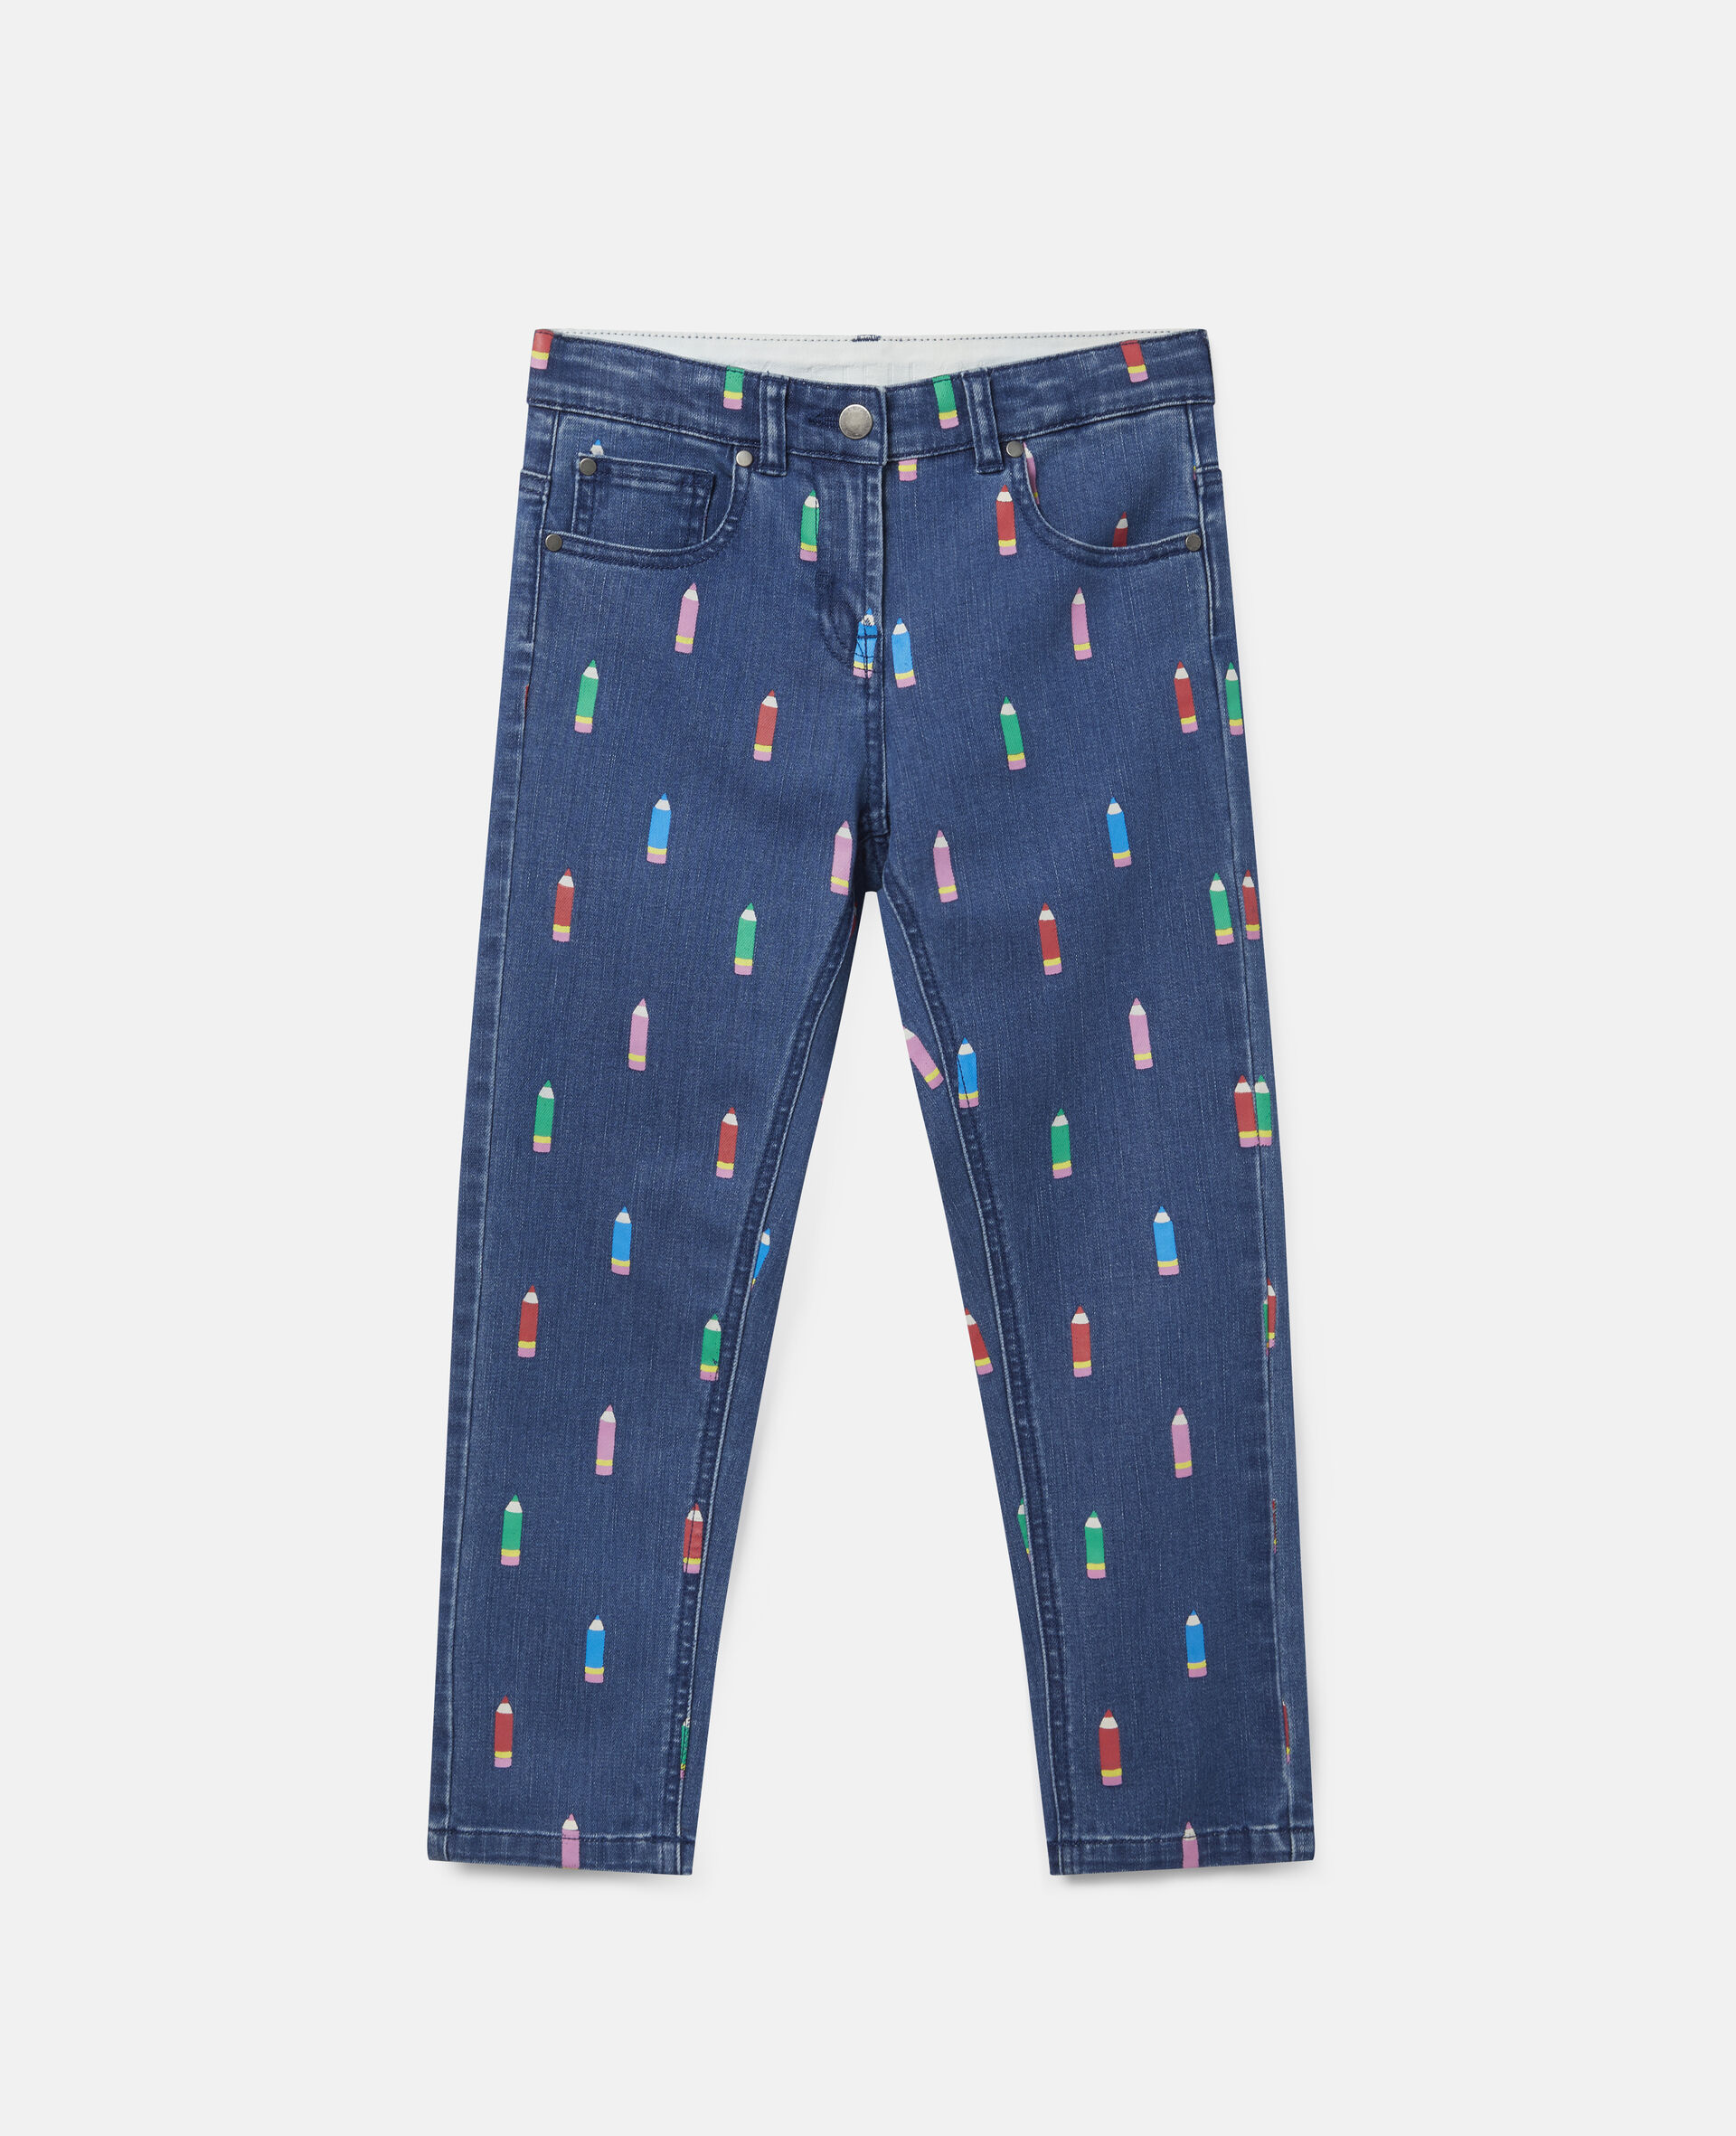 Pencils Denim Trousers-Blue-large image number 0